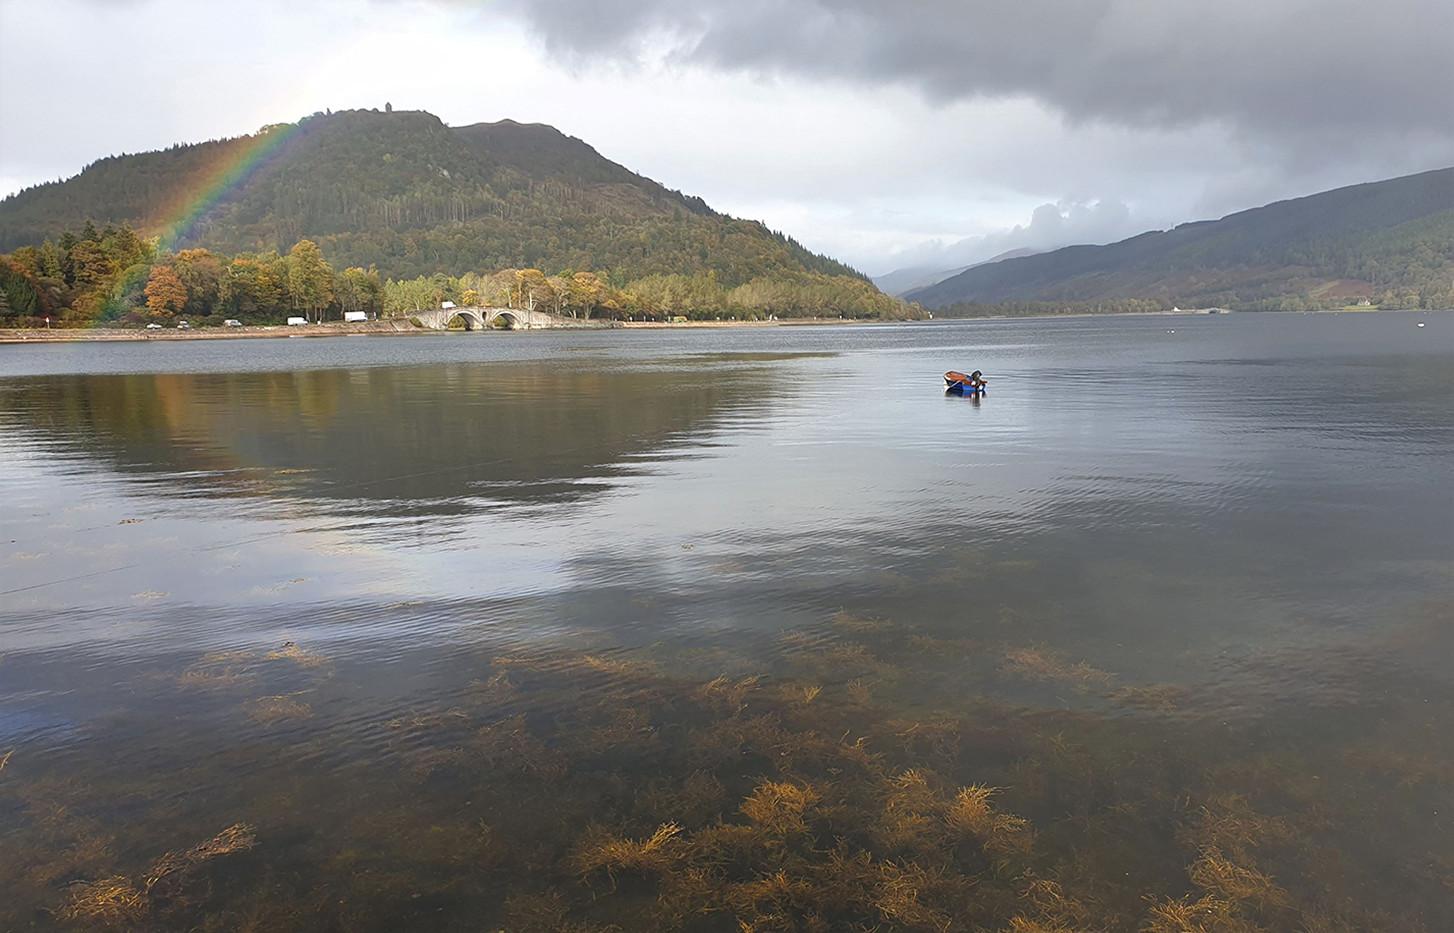 Autumnal day at Loch Fyne - Fiona Biggart